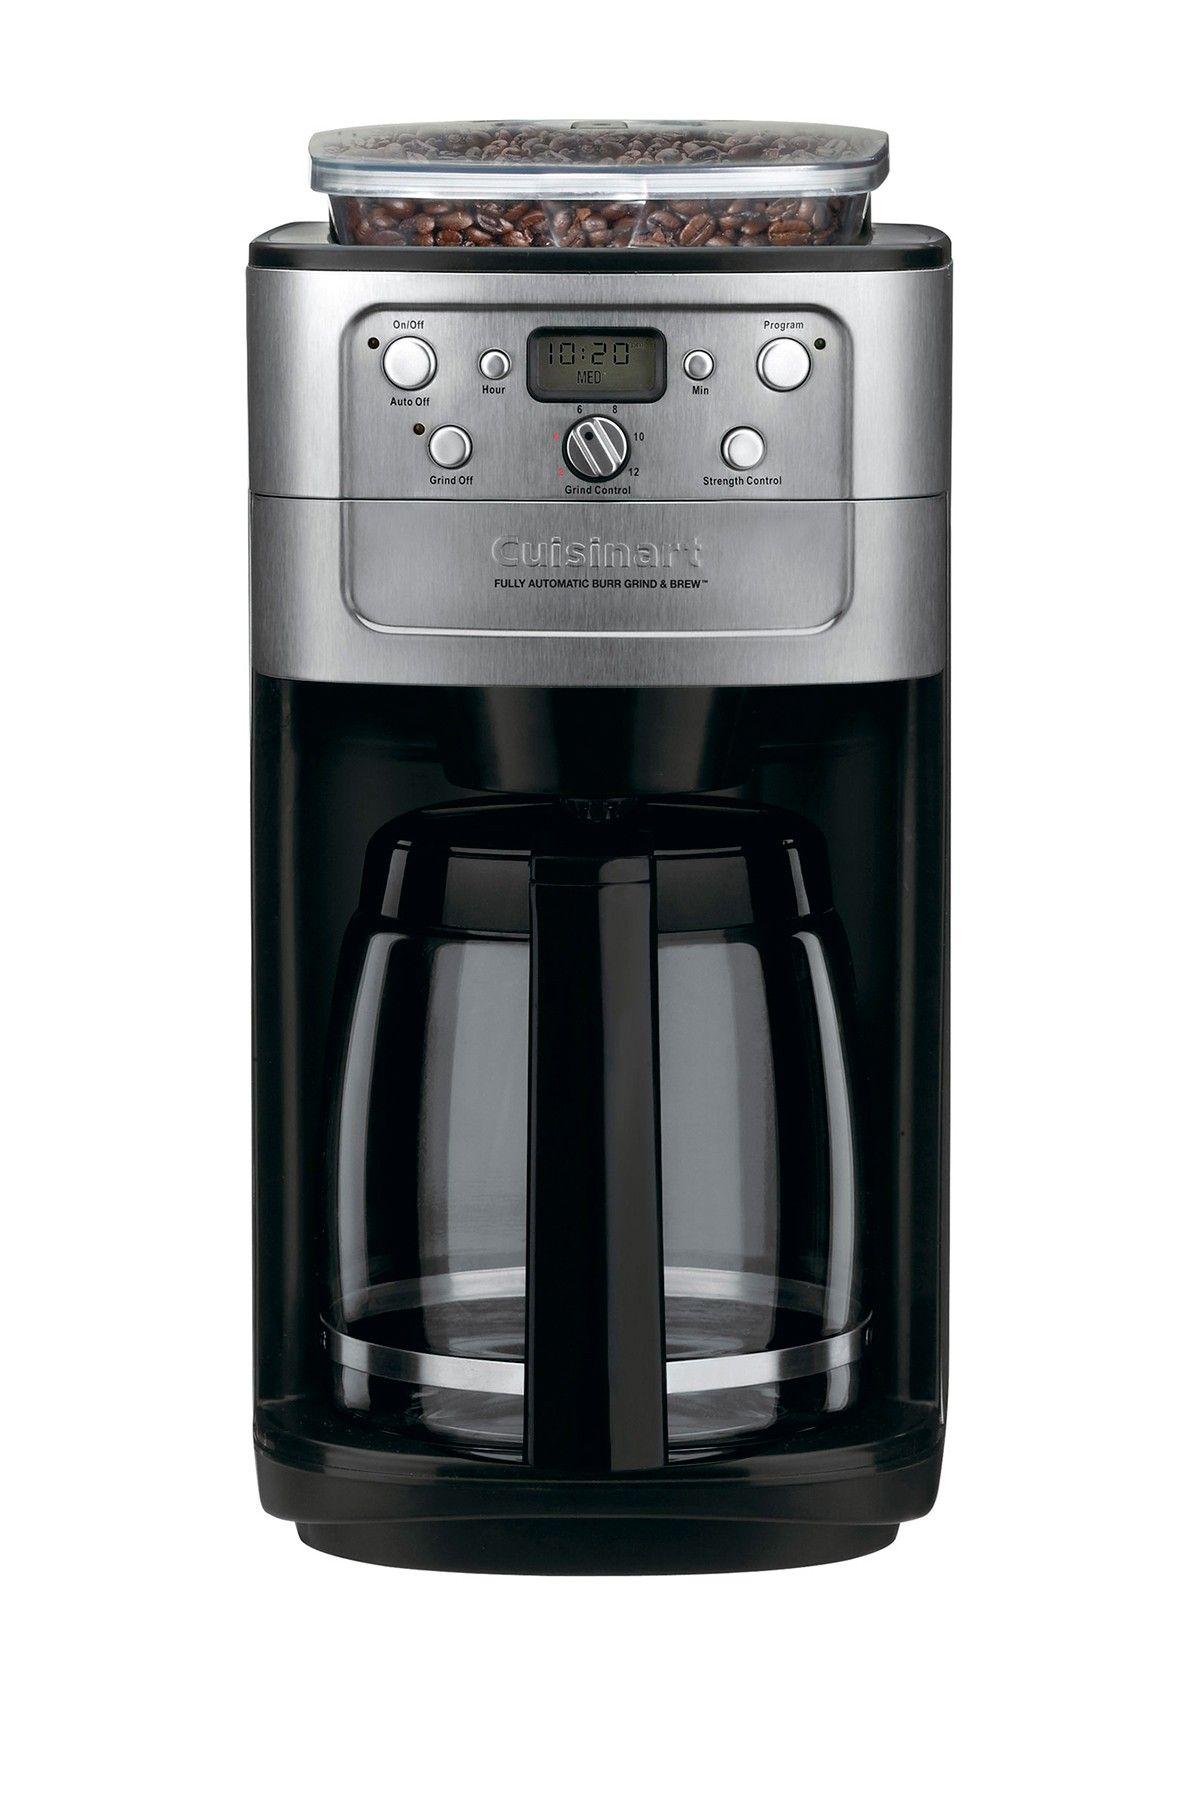 Cuisinart Grind & Brew 12Cup Coffeemaker Coffee maker